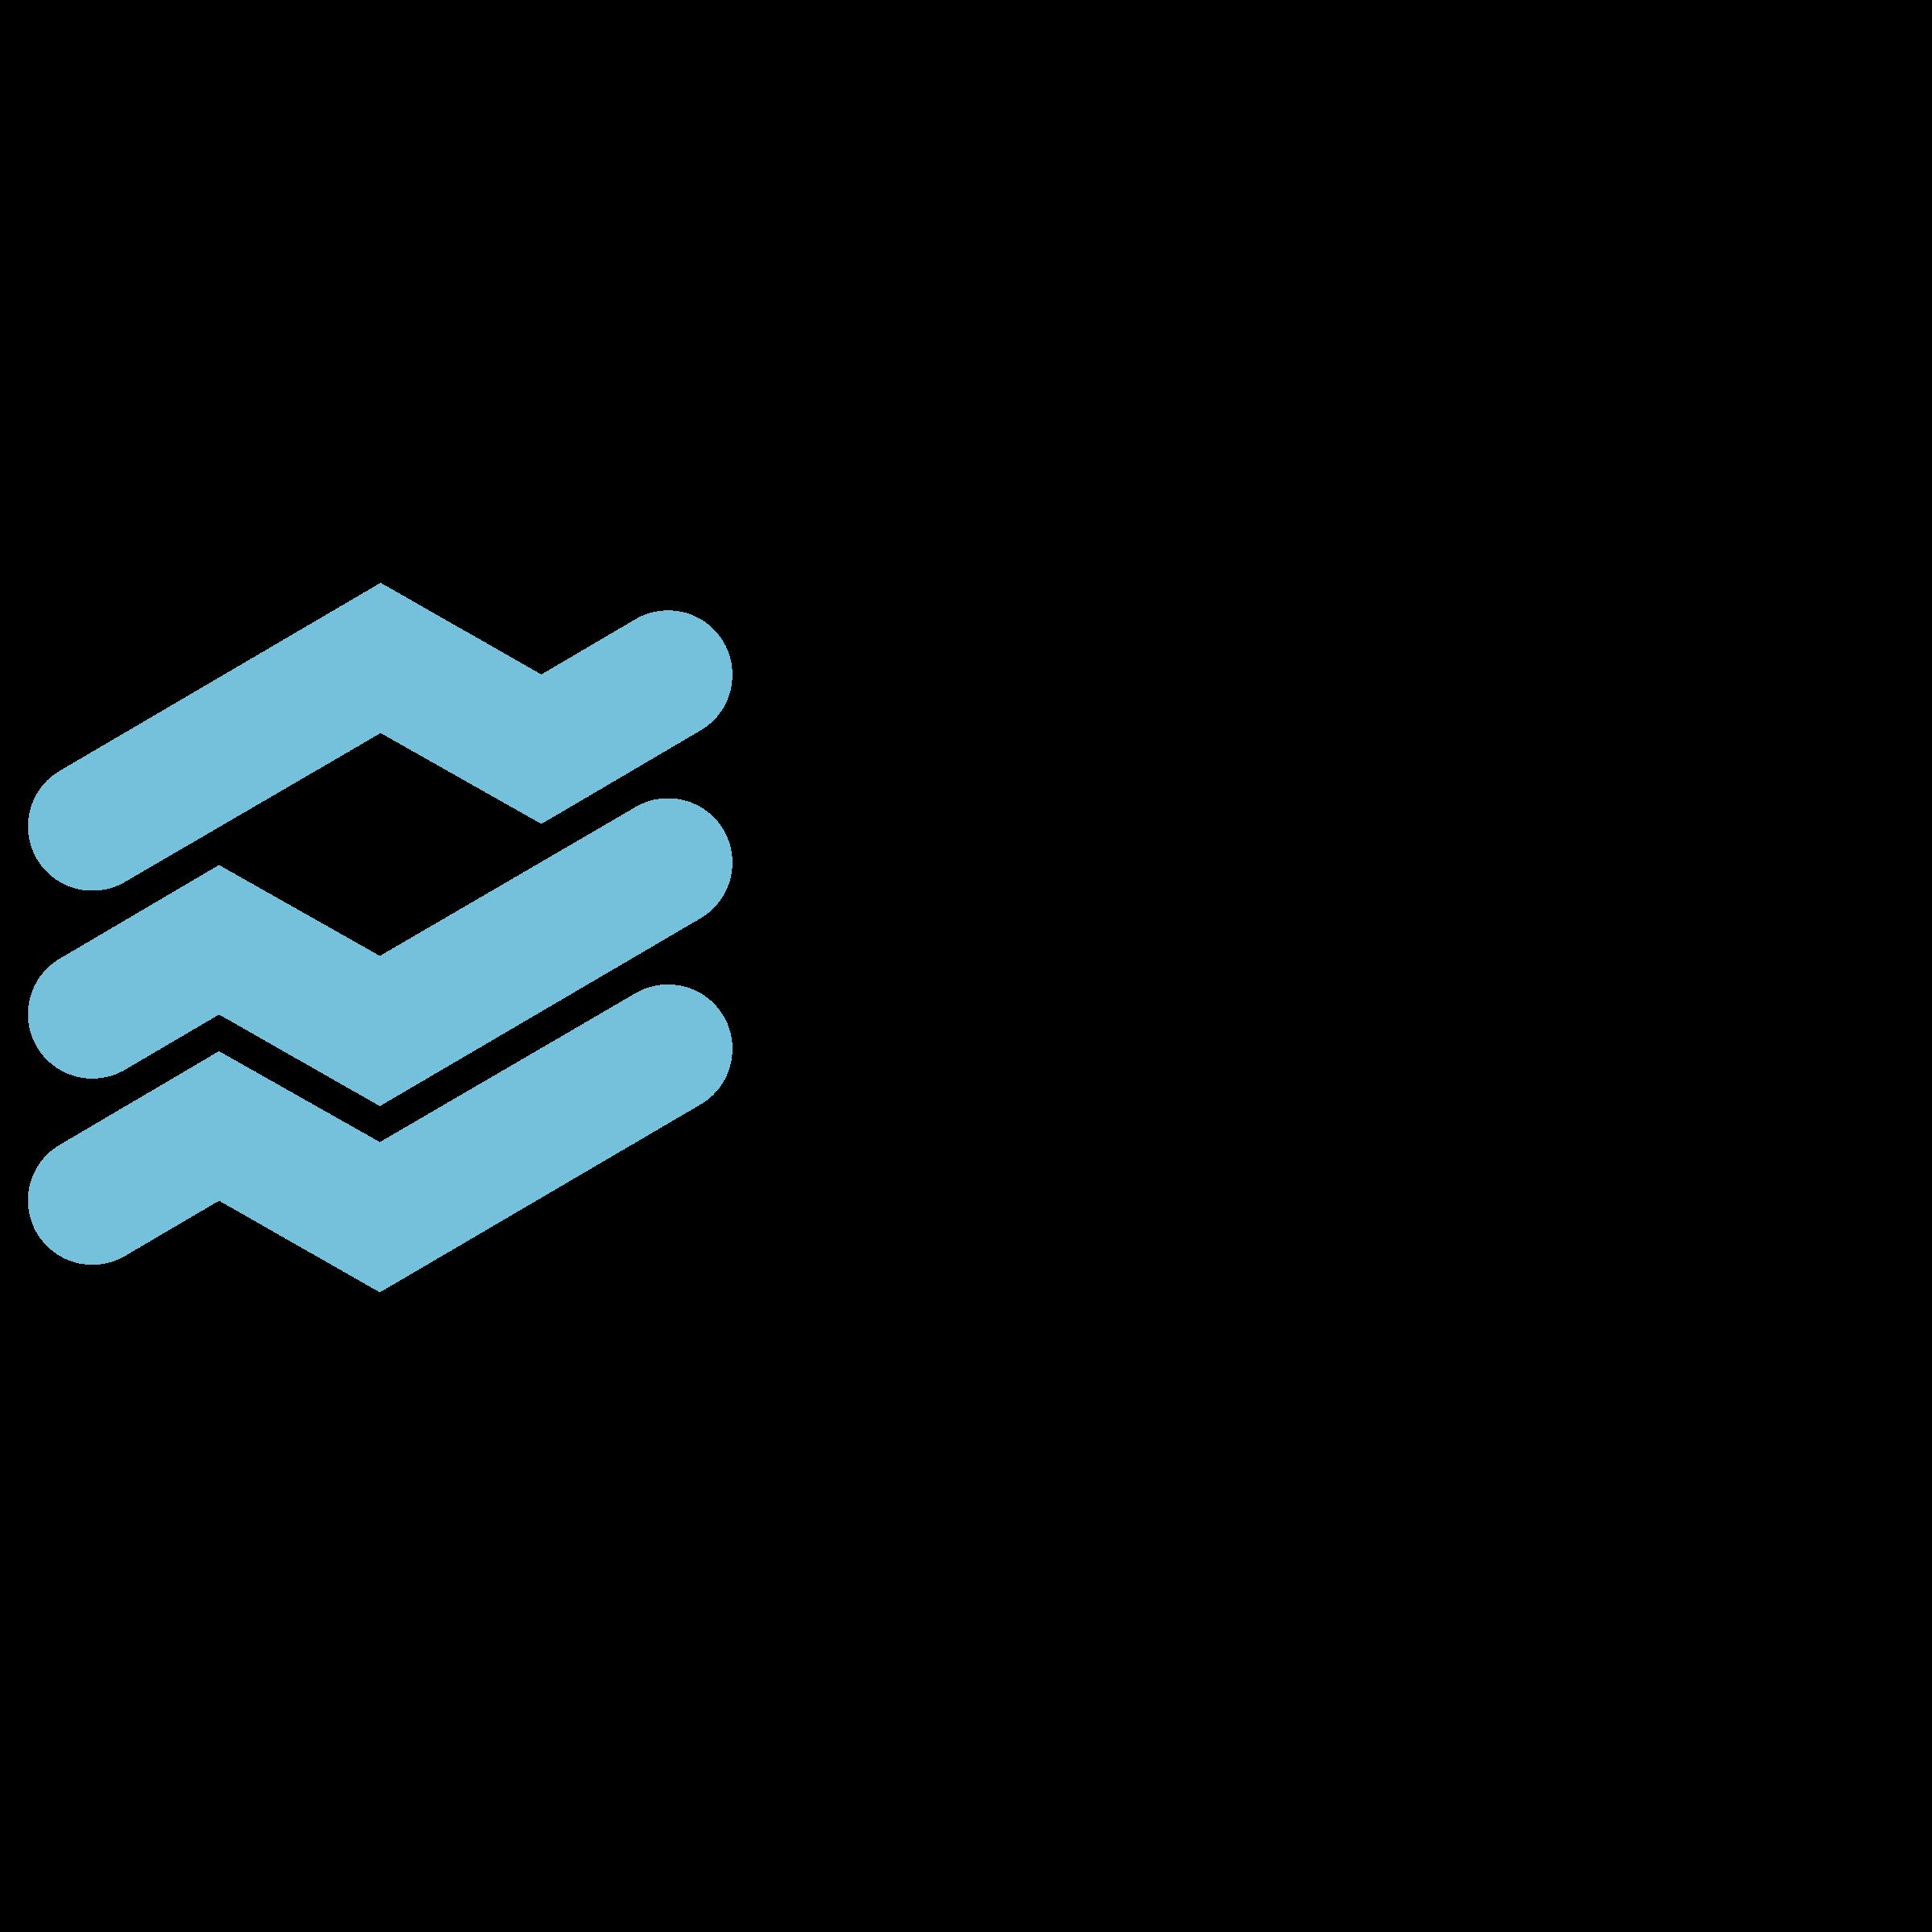 port-of-rotterdam-logo-png-transparent